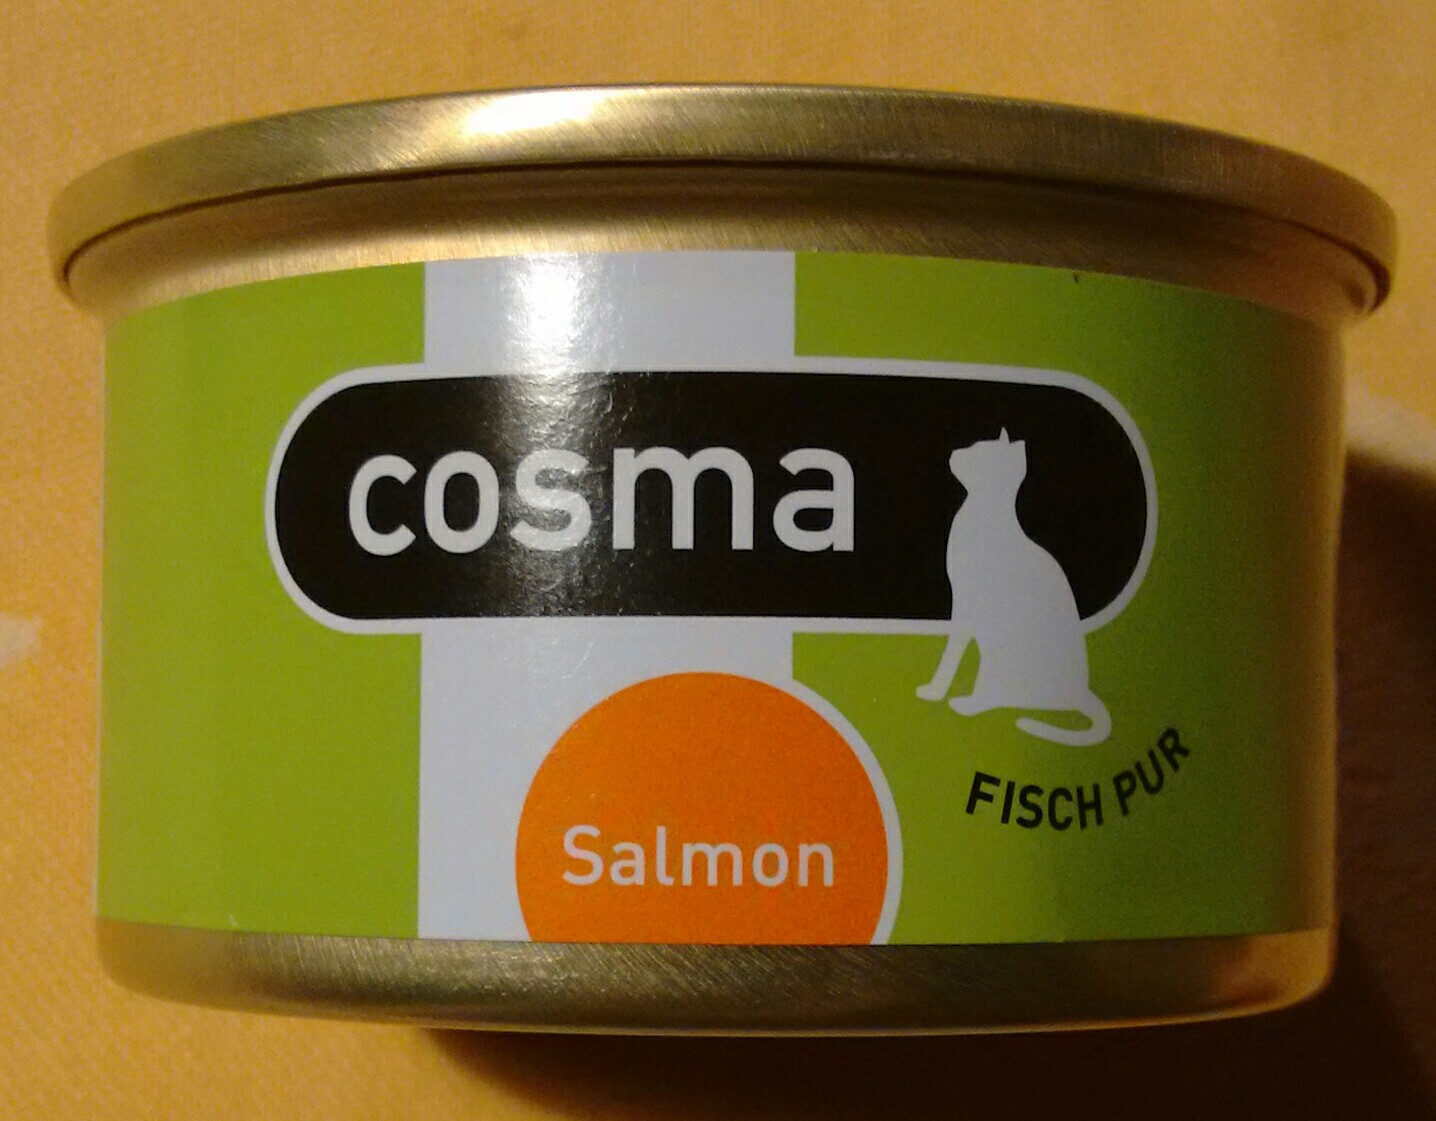 Cosma Salmon Fish pur - Product - fr